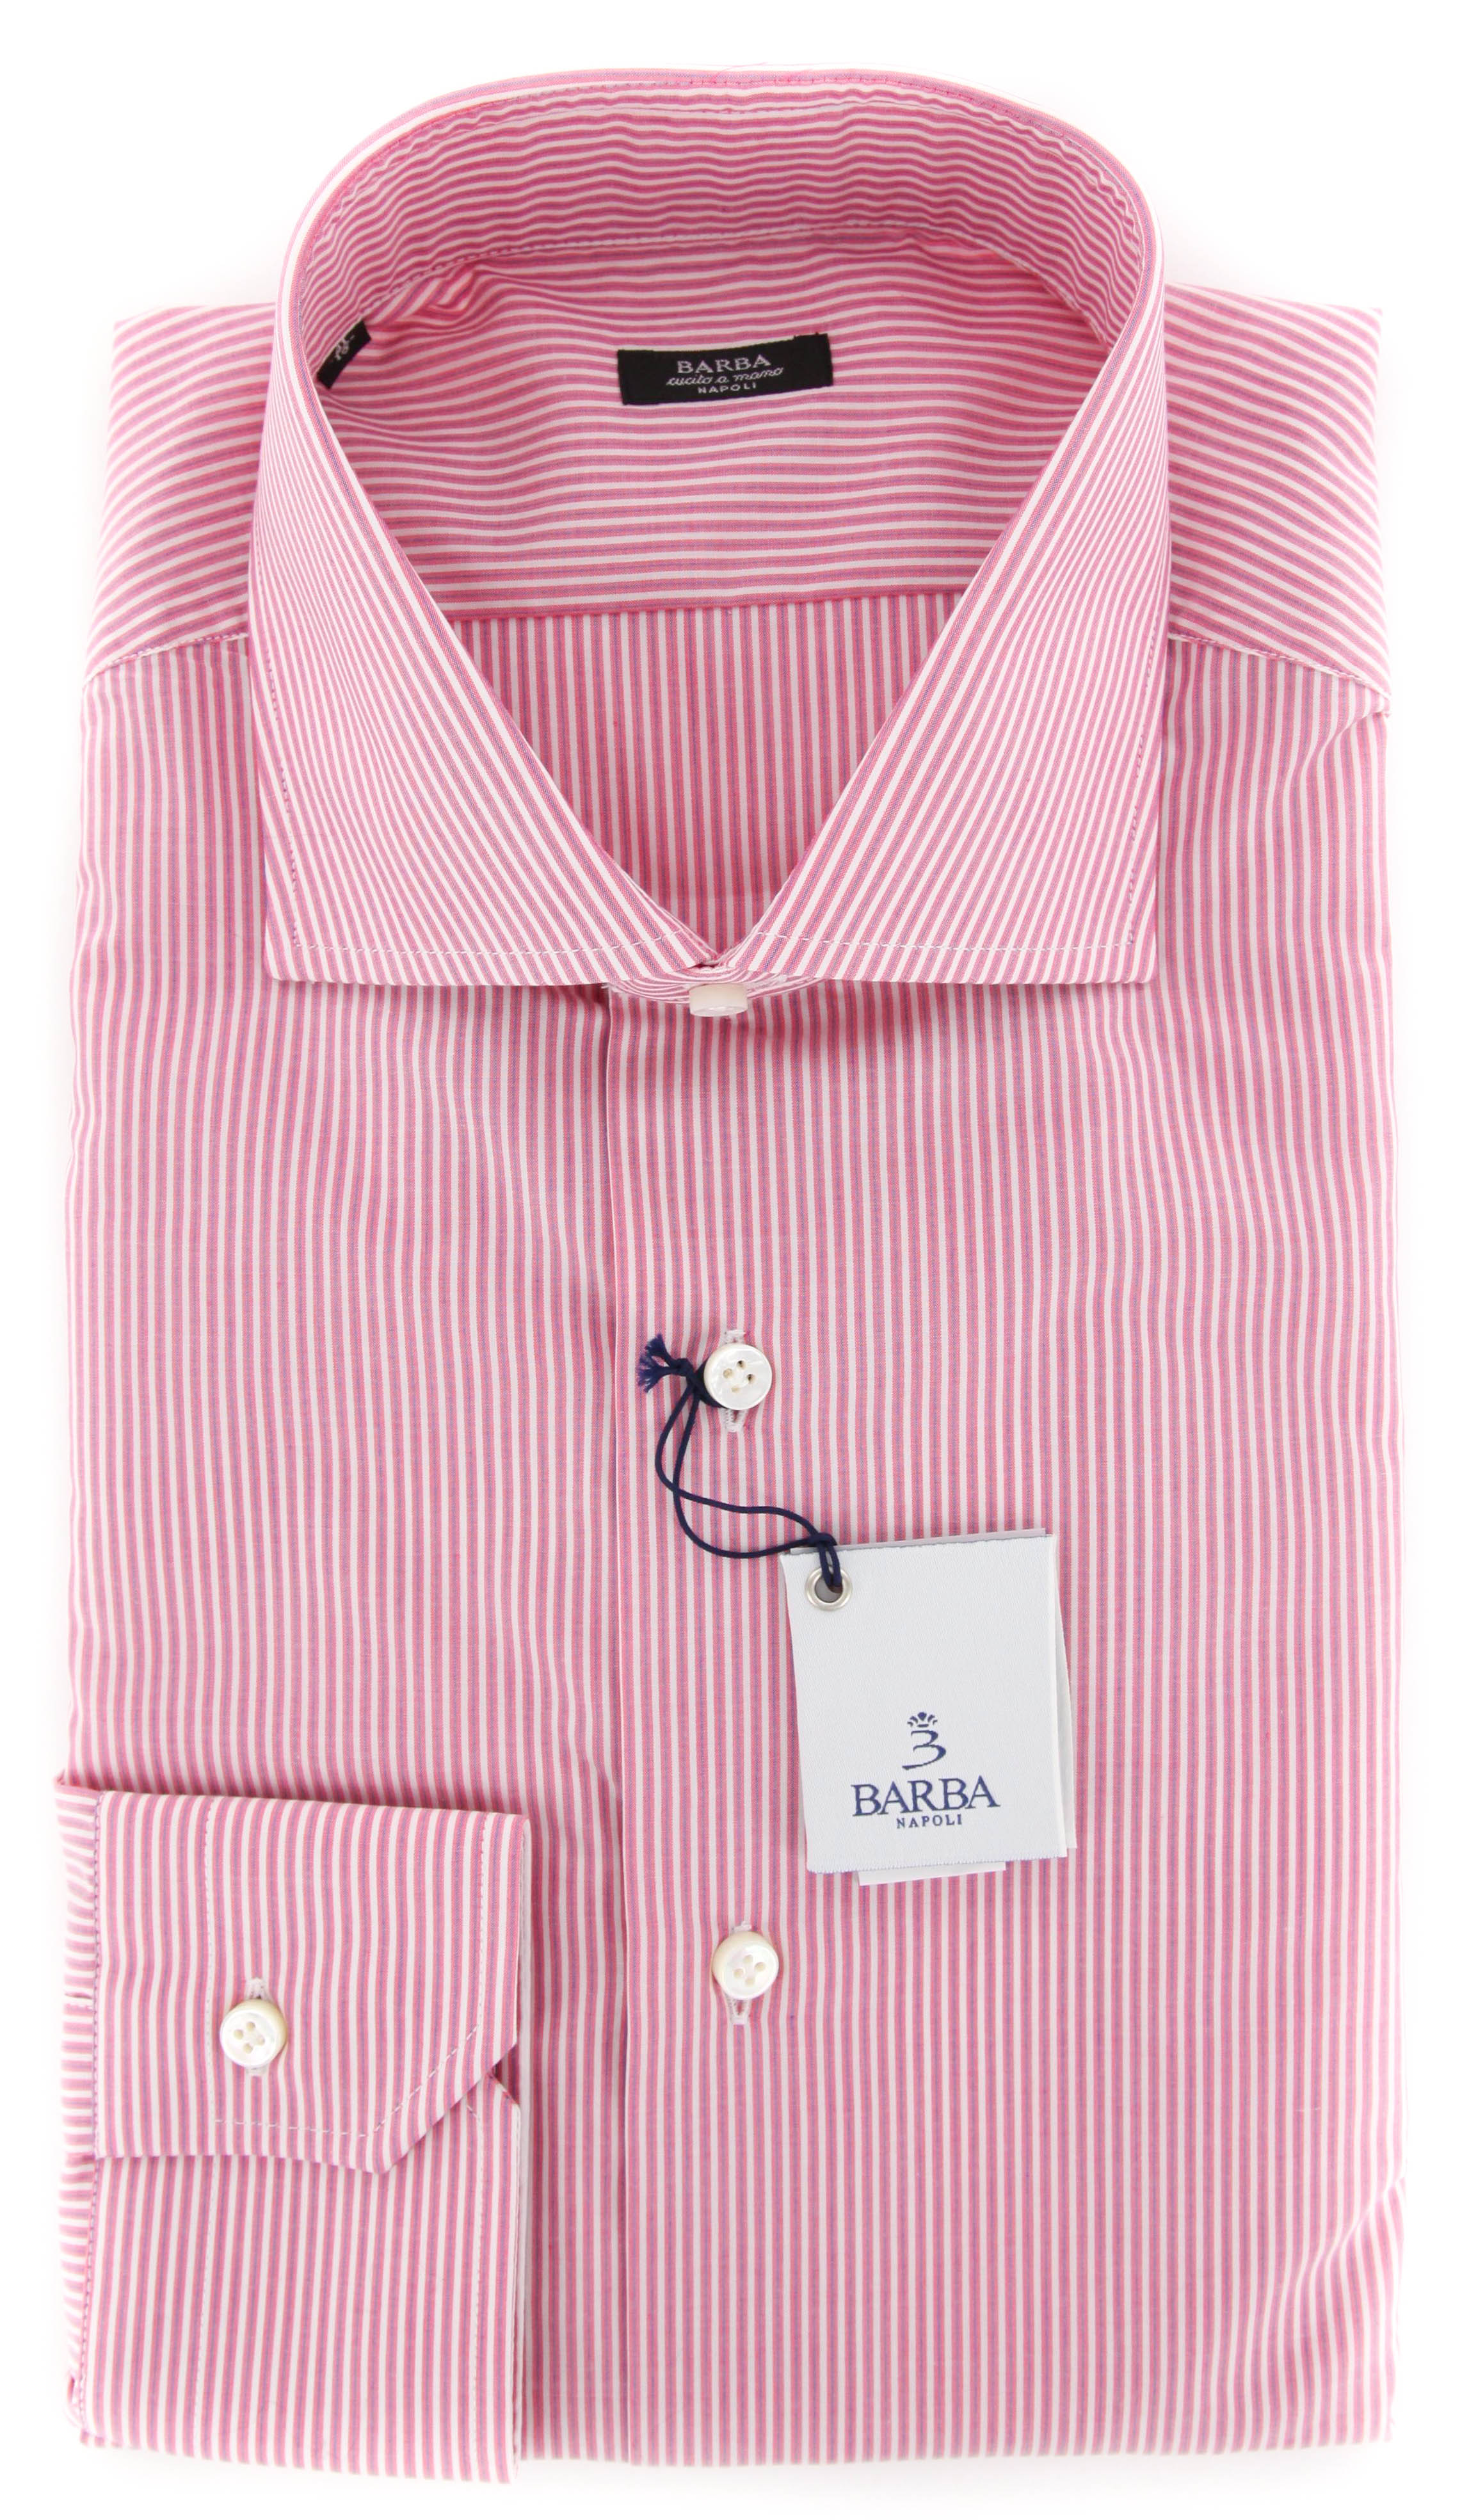 $325 Barba Napoli Red Striped Shirt Extra Slim i1u82u13r